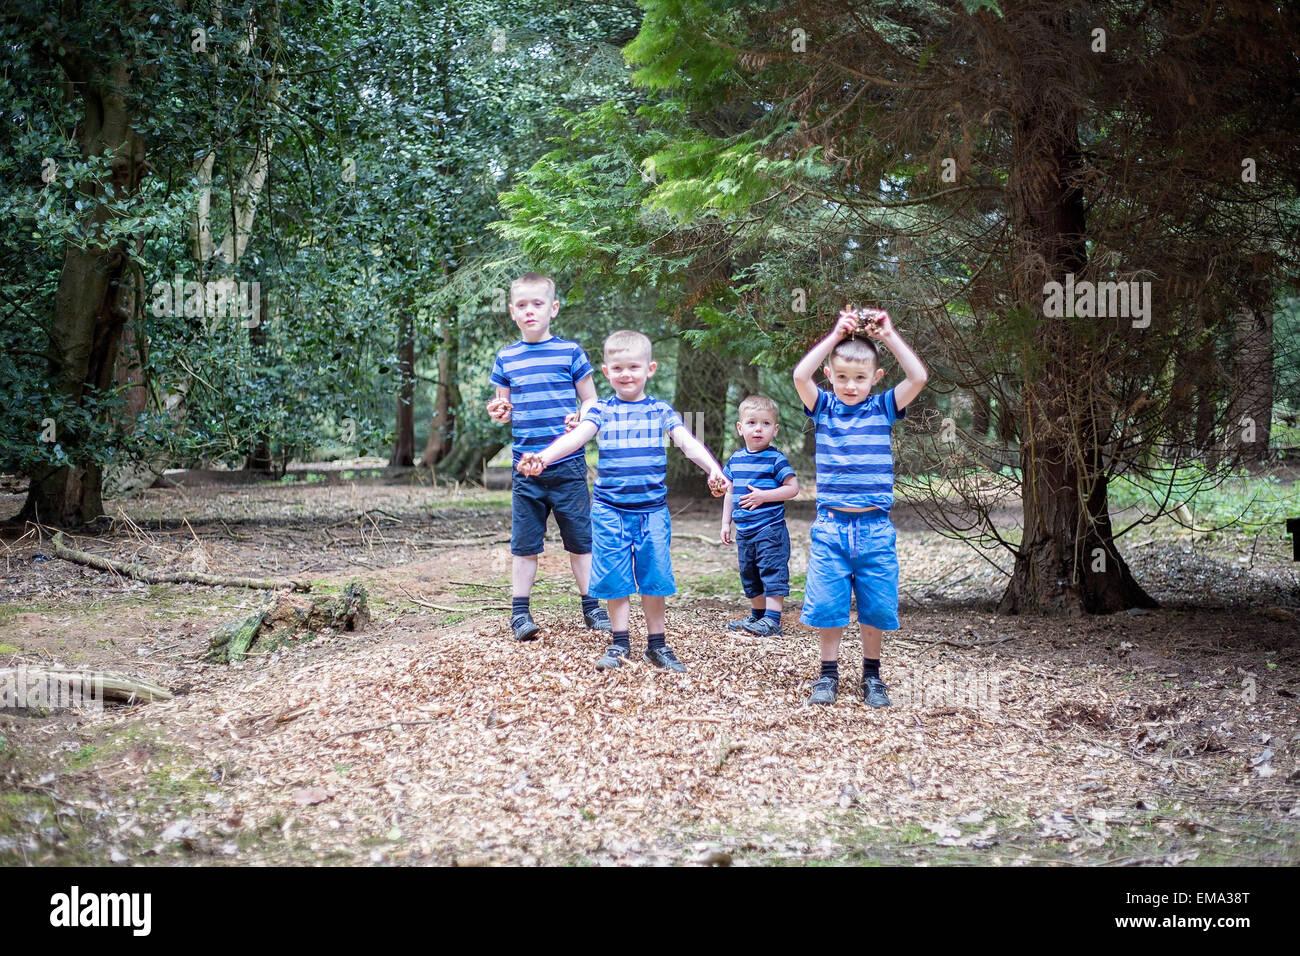 Boys playing woods matching blue running fun - Stock Image